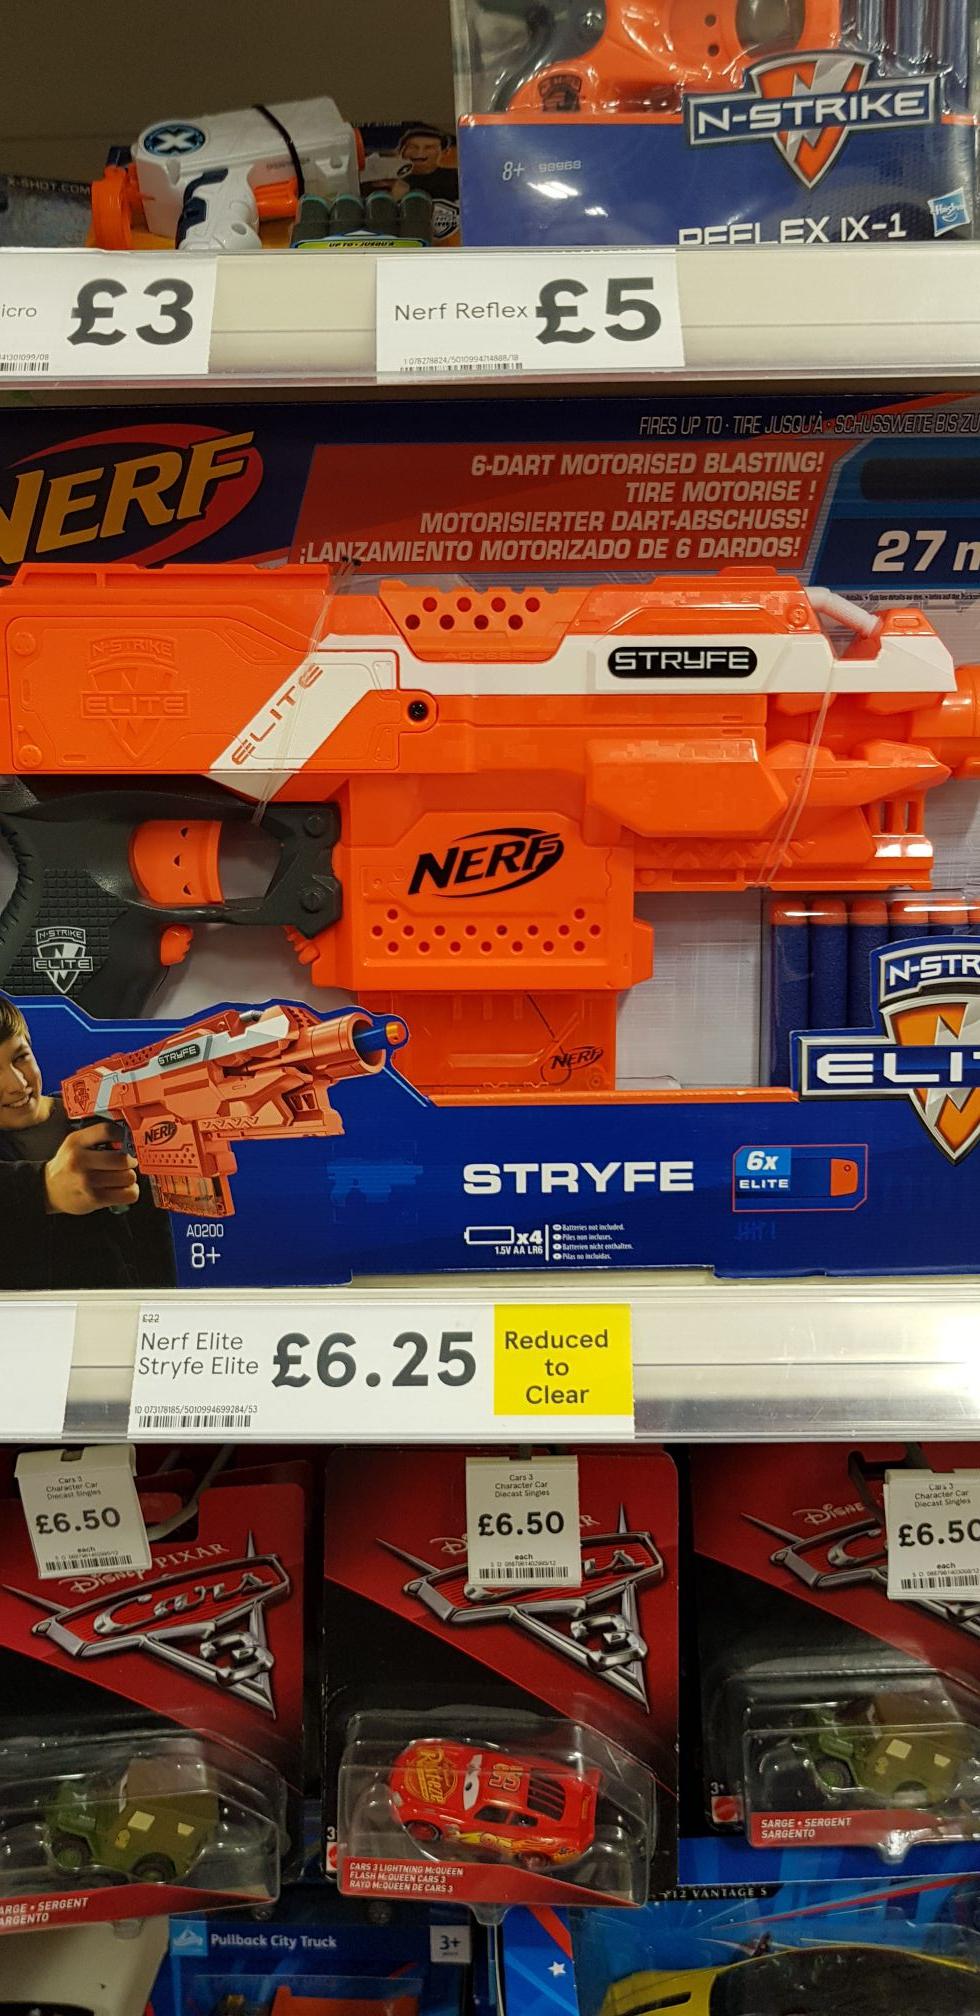 Nerf elite stryfe gun £6.25 instore Tesco Bangor NI